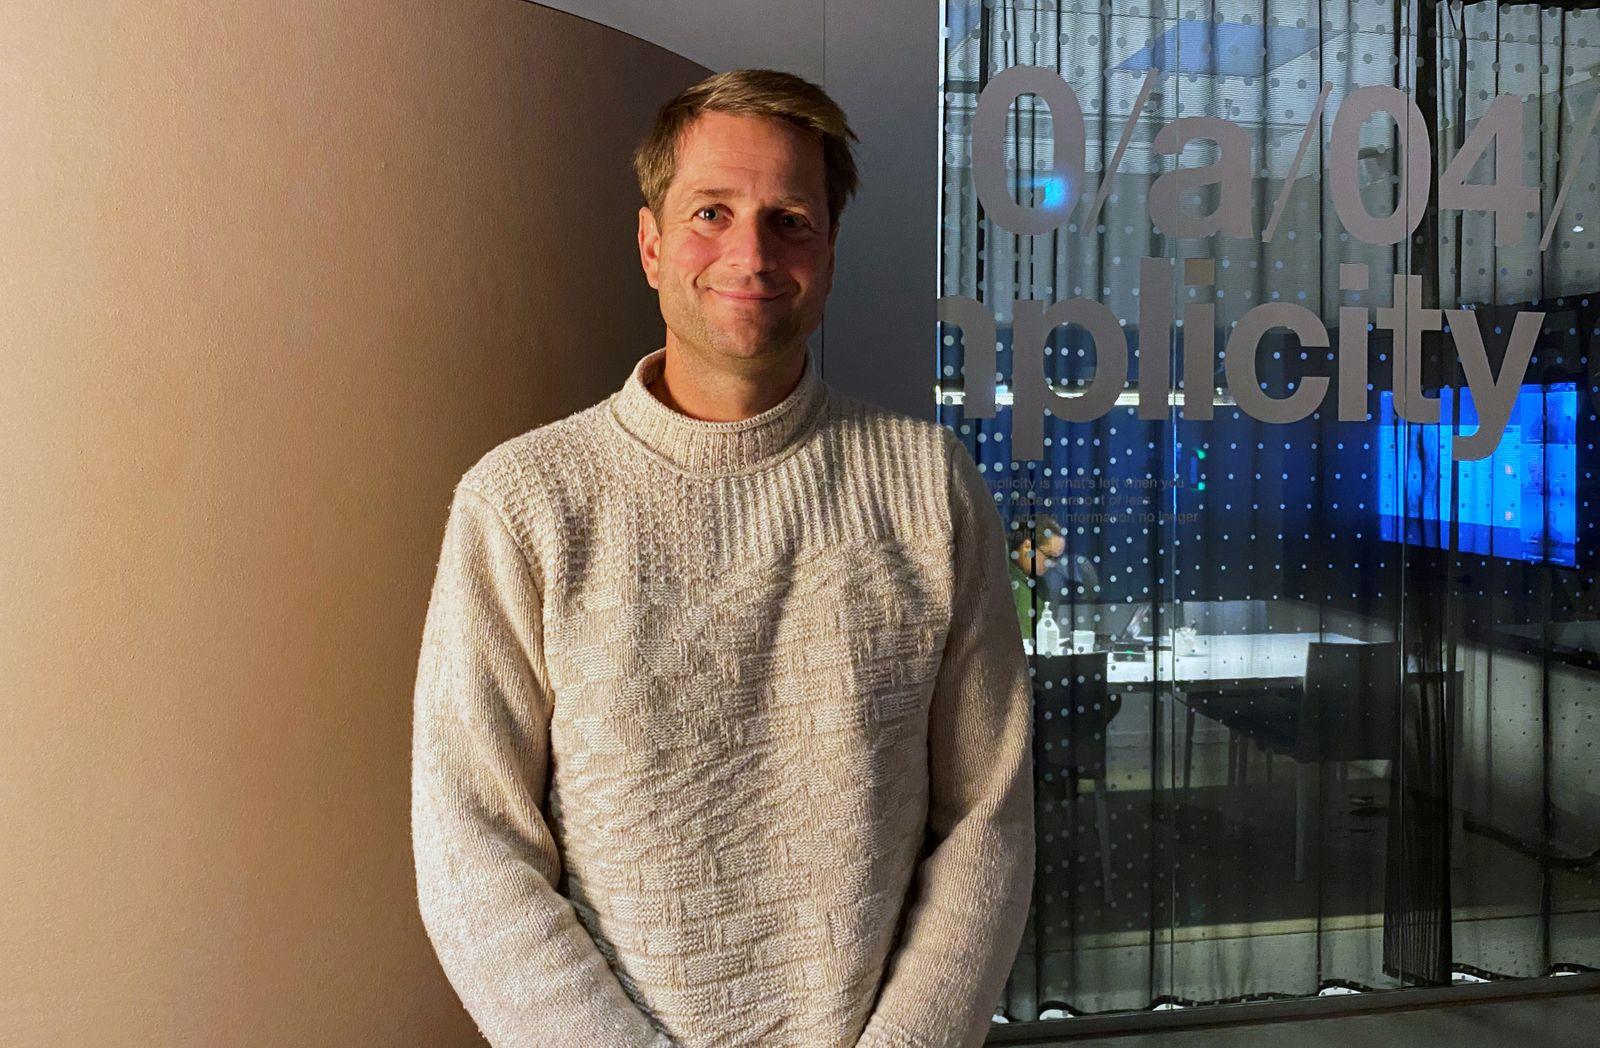 Klarna CEO Sebastian Siemiatkowski poses for a picture in company's office in Stockholm